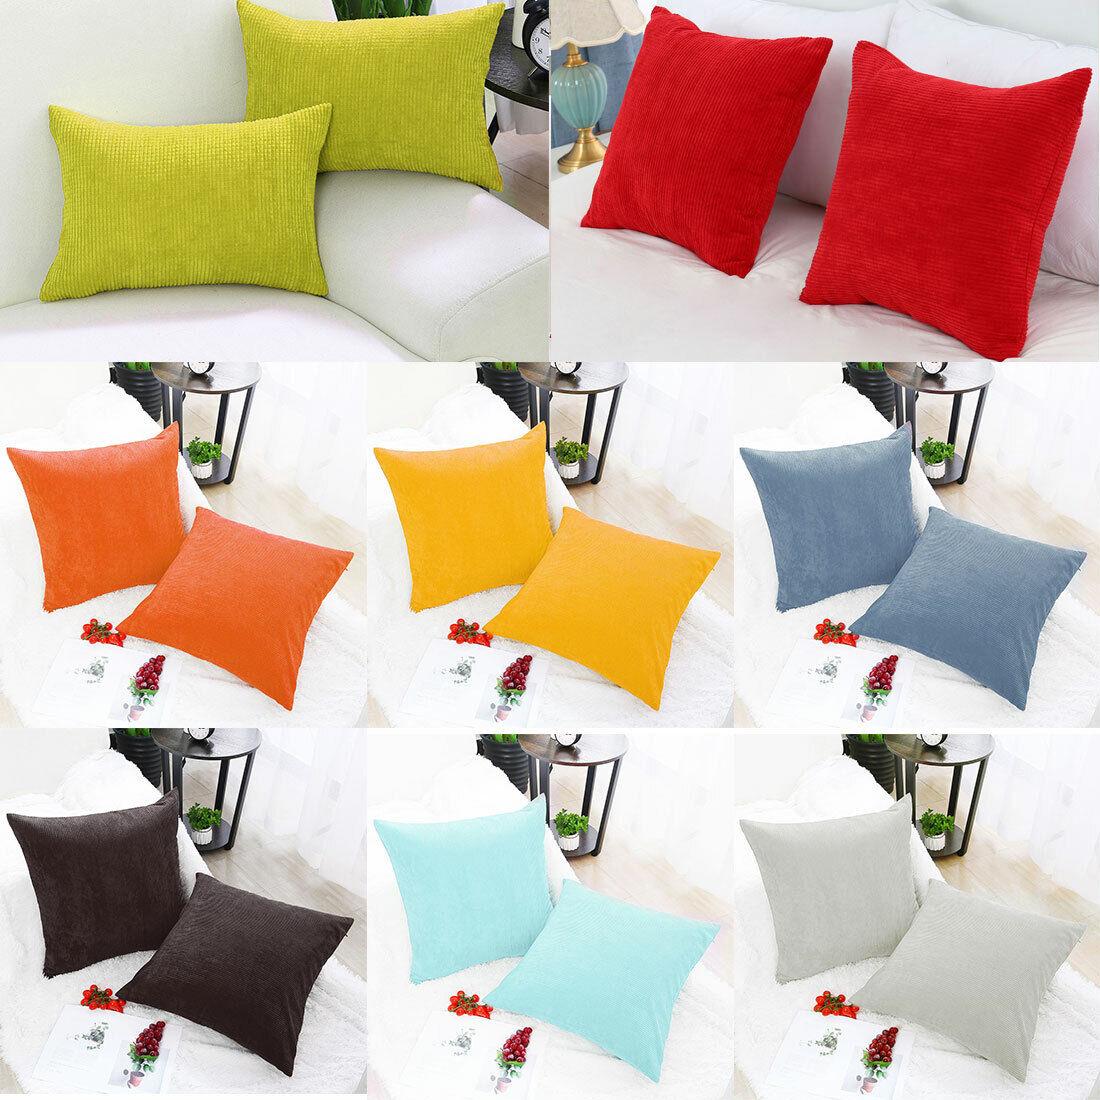 BIGU Cushion Covers Elegant Soft Striped Corduroy Square Solid Pillow Covers Home Decoration Sofa Car Waist Plain Throw Pillow Case 28x28 70X70CM Red